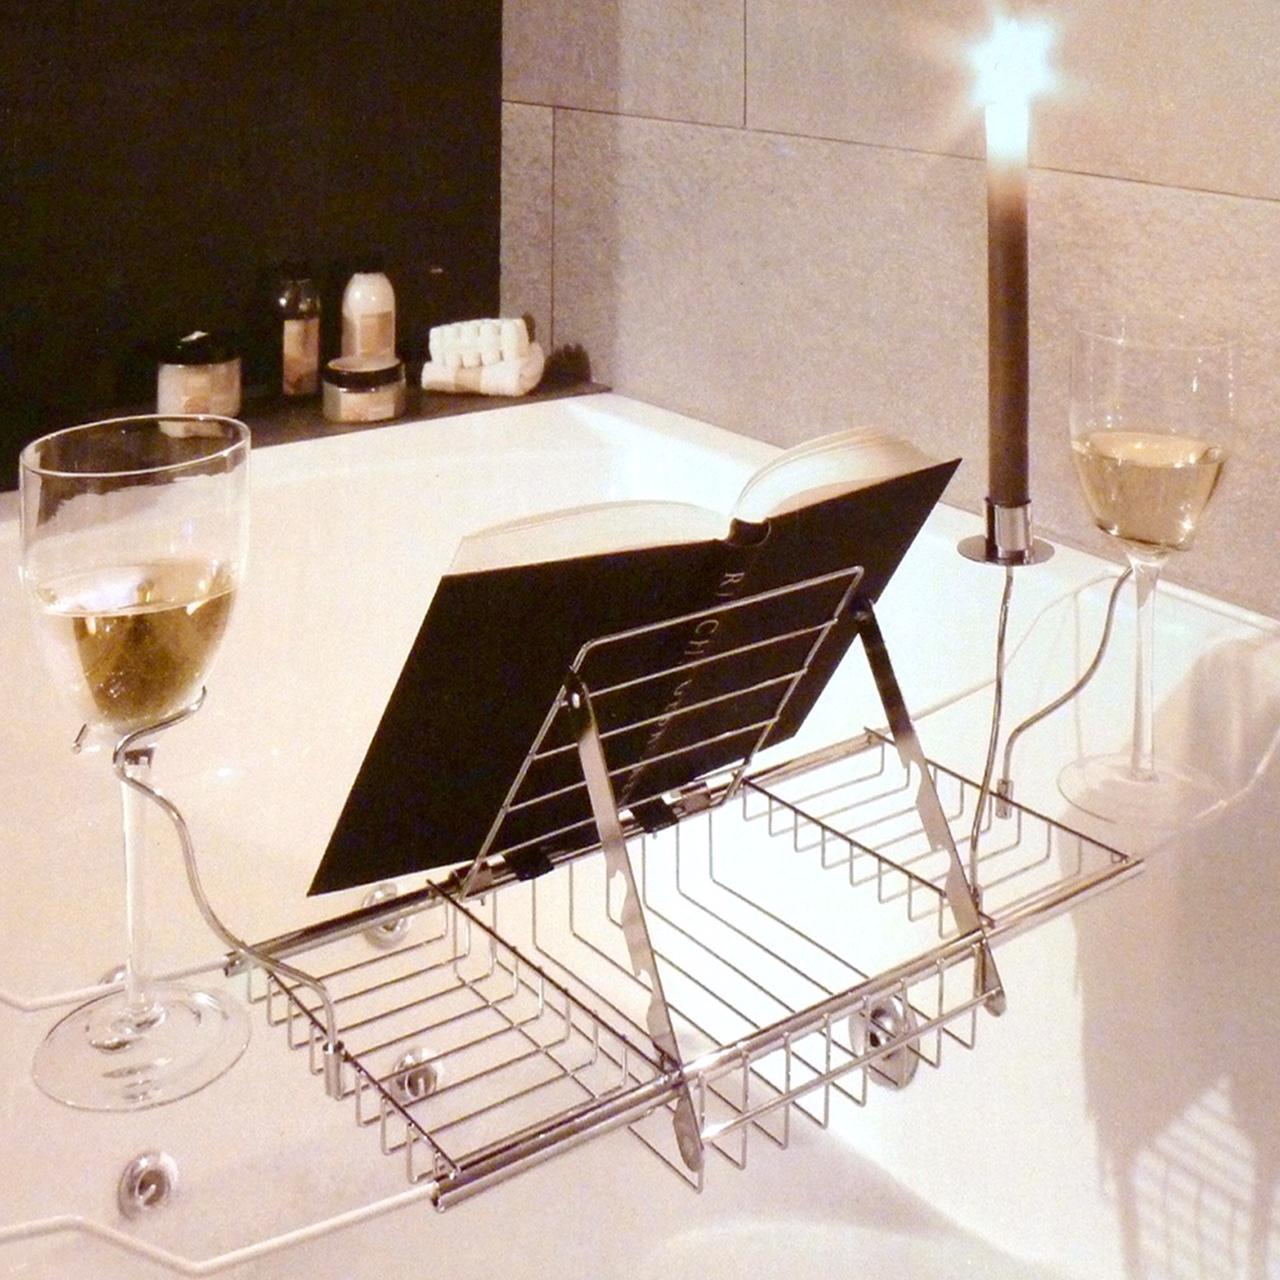 Contemporary Book Holder For Bath Ideas - Bathroom and Shower Ideas ...